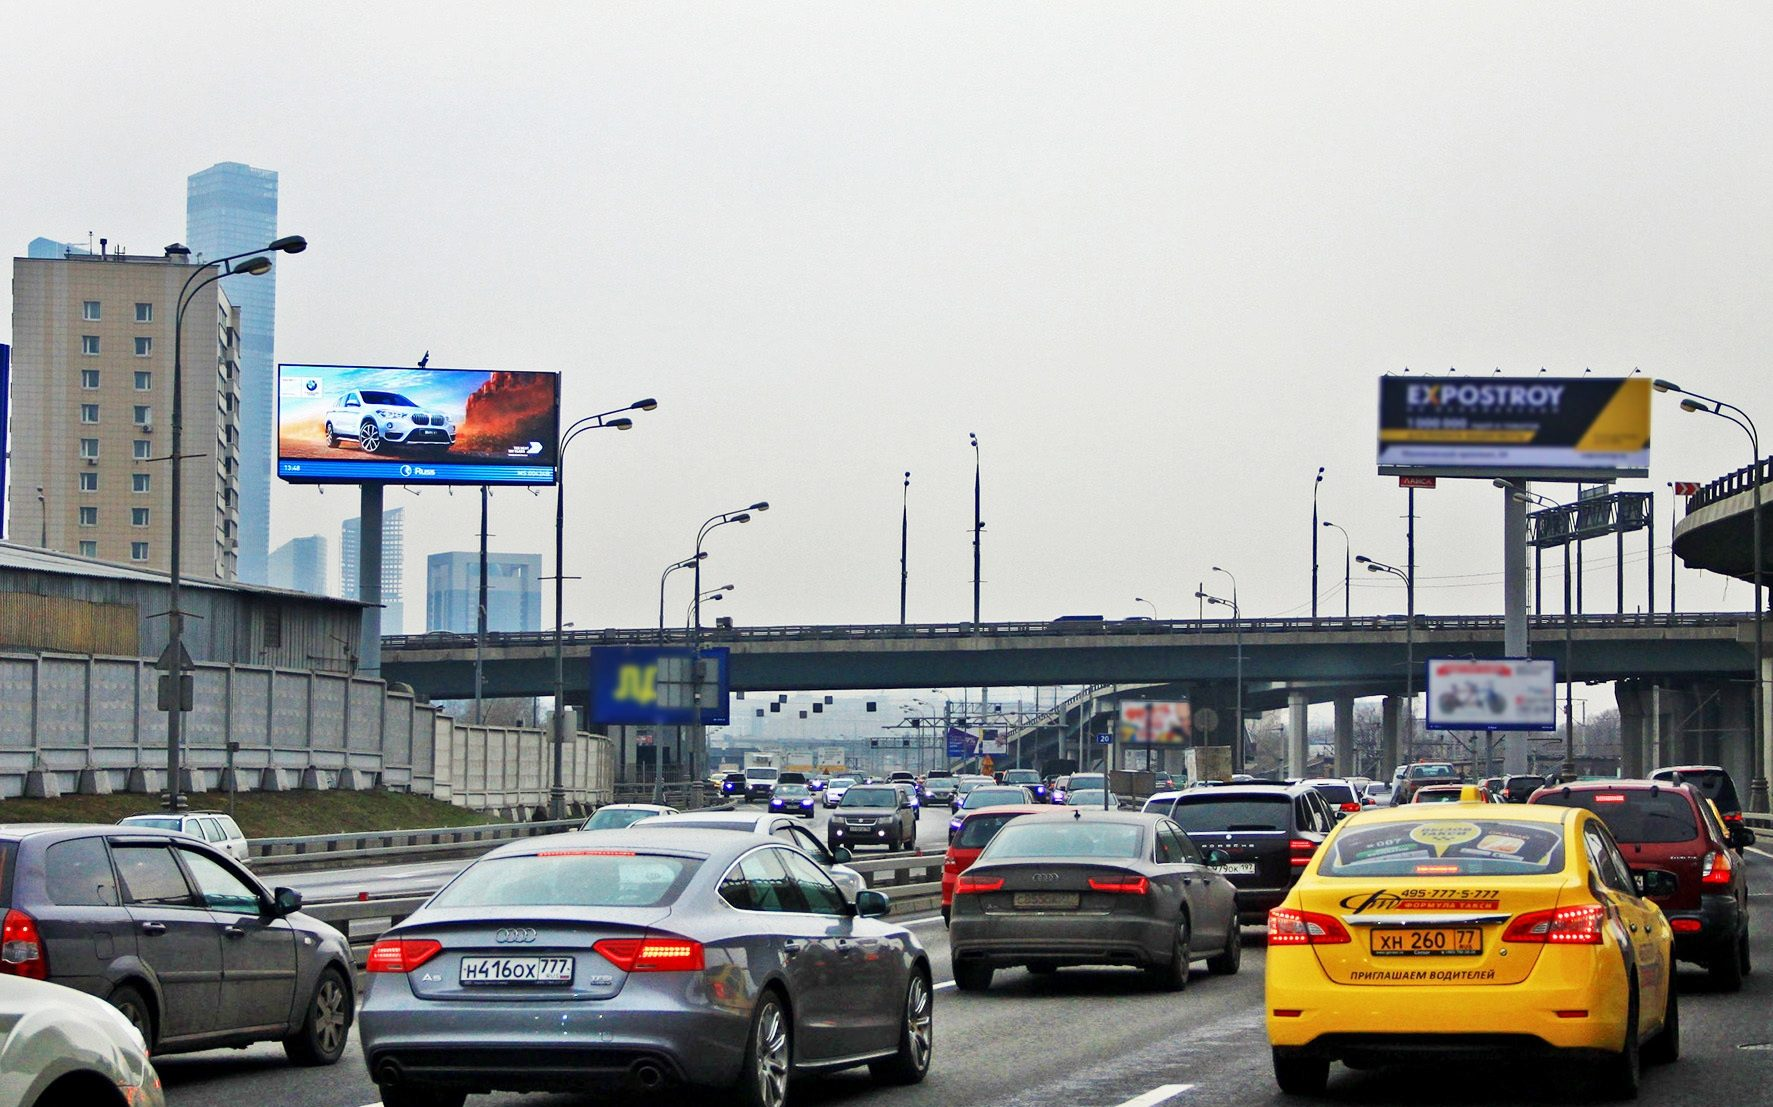 В Москве движение по ТТК ограничено почти на все лето